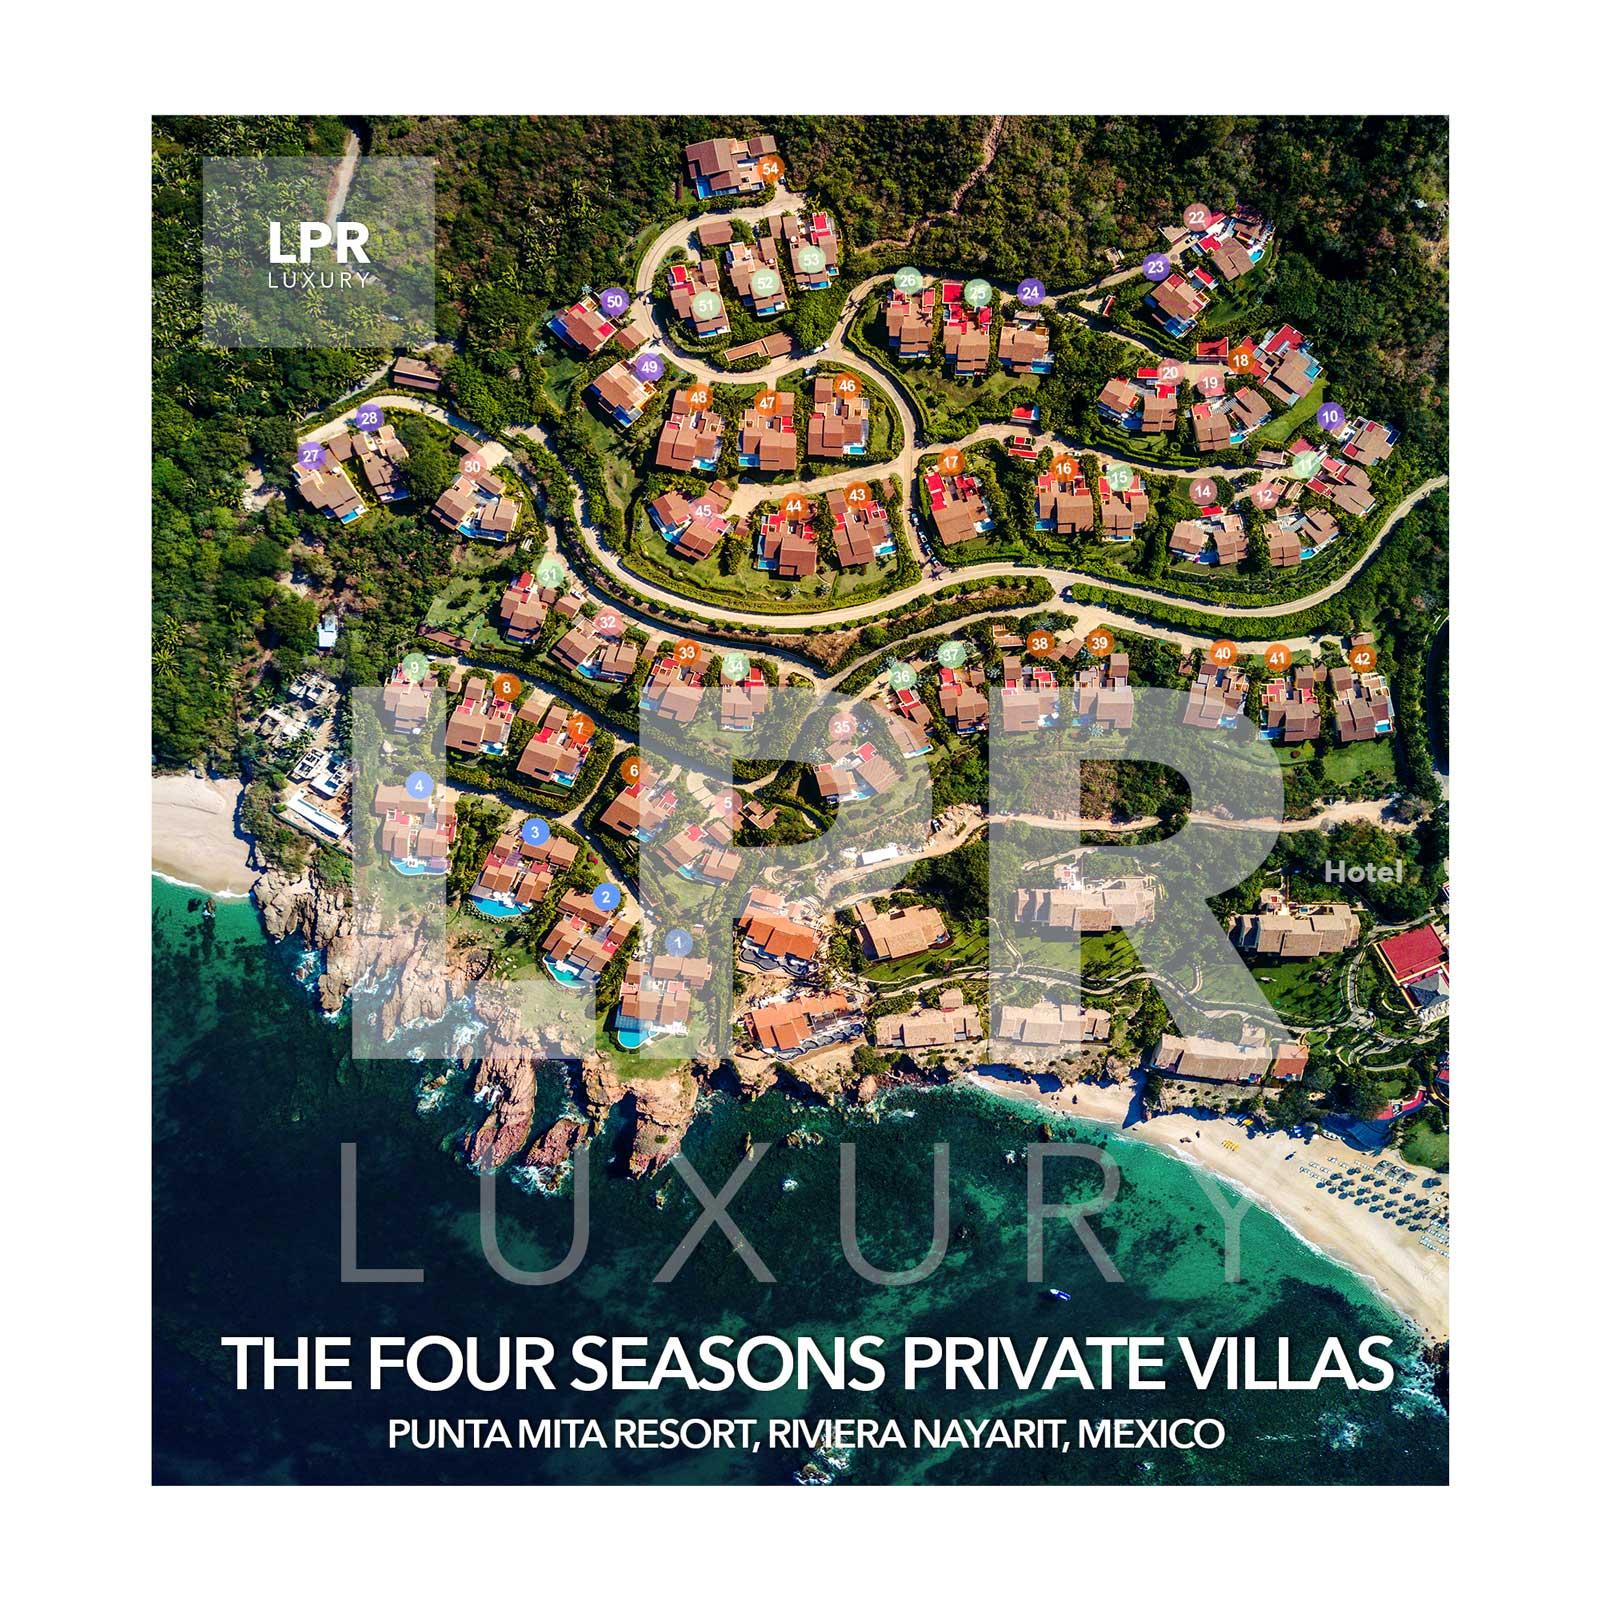 Four Seasons Private Villas - Four Seasons Resort - Punta Mita, Riviera Nayarit, Mexico